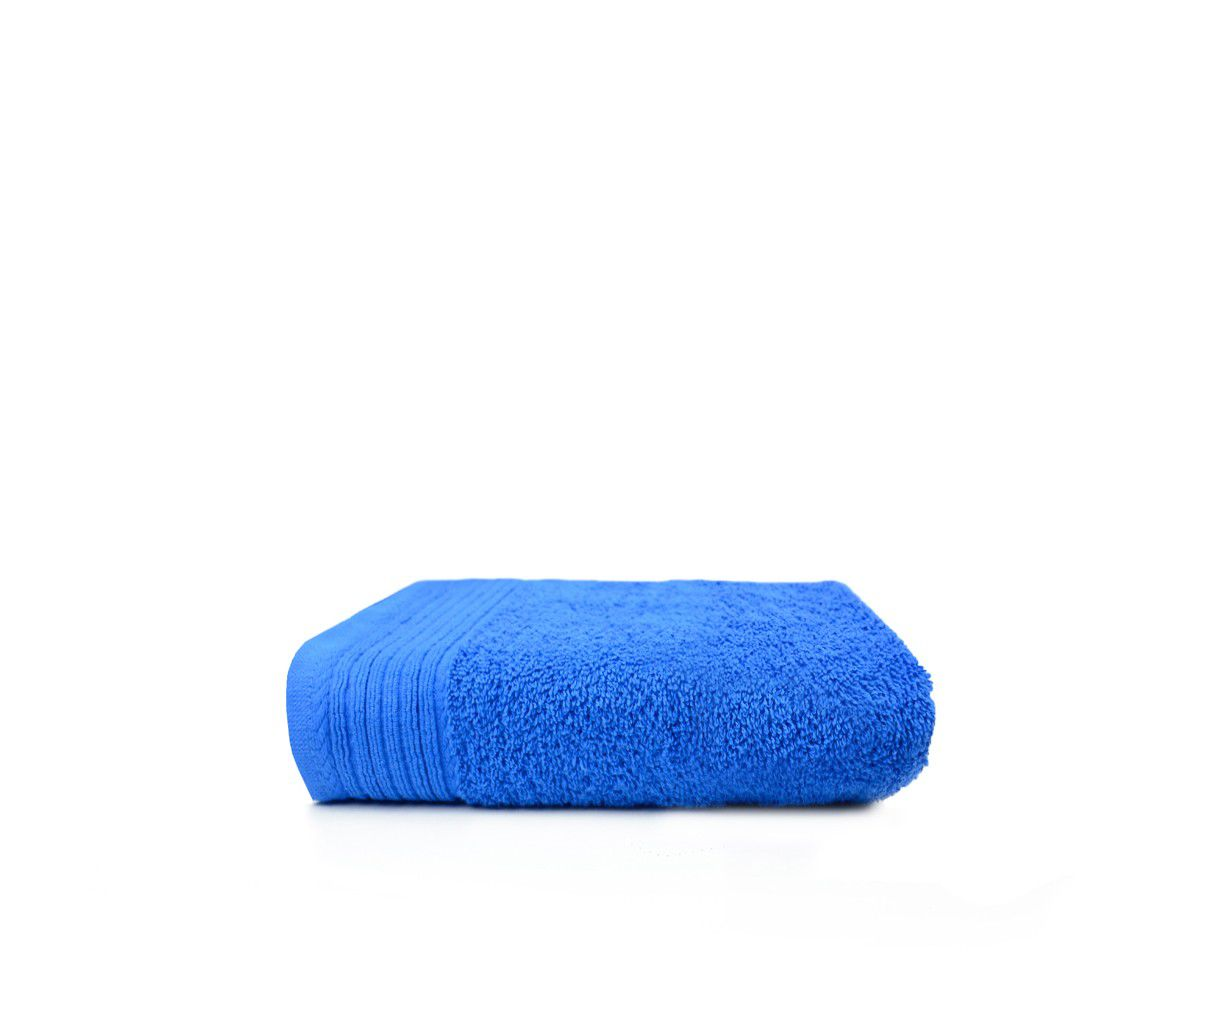 The One Handdoek 450 gram 50x100 cm Royal Blue